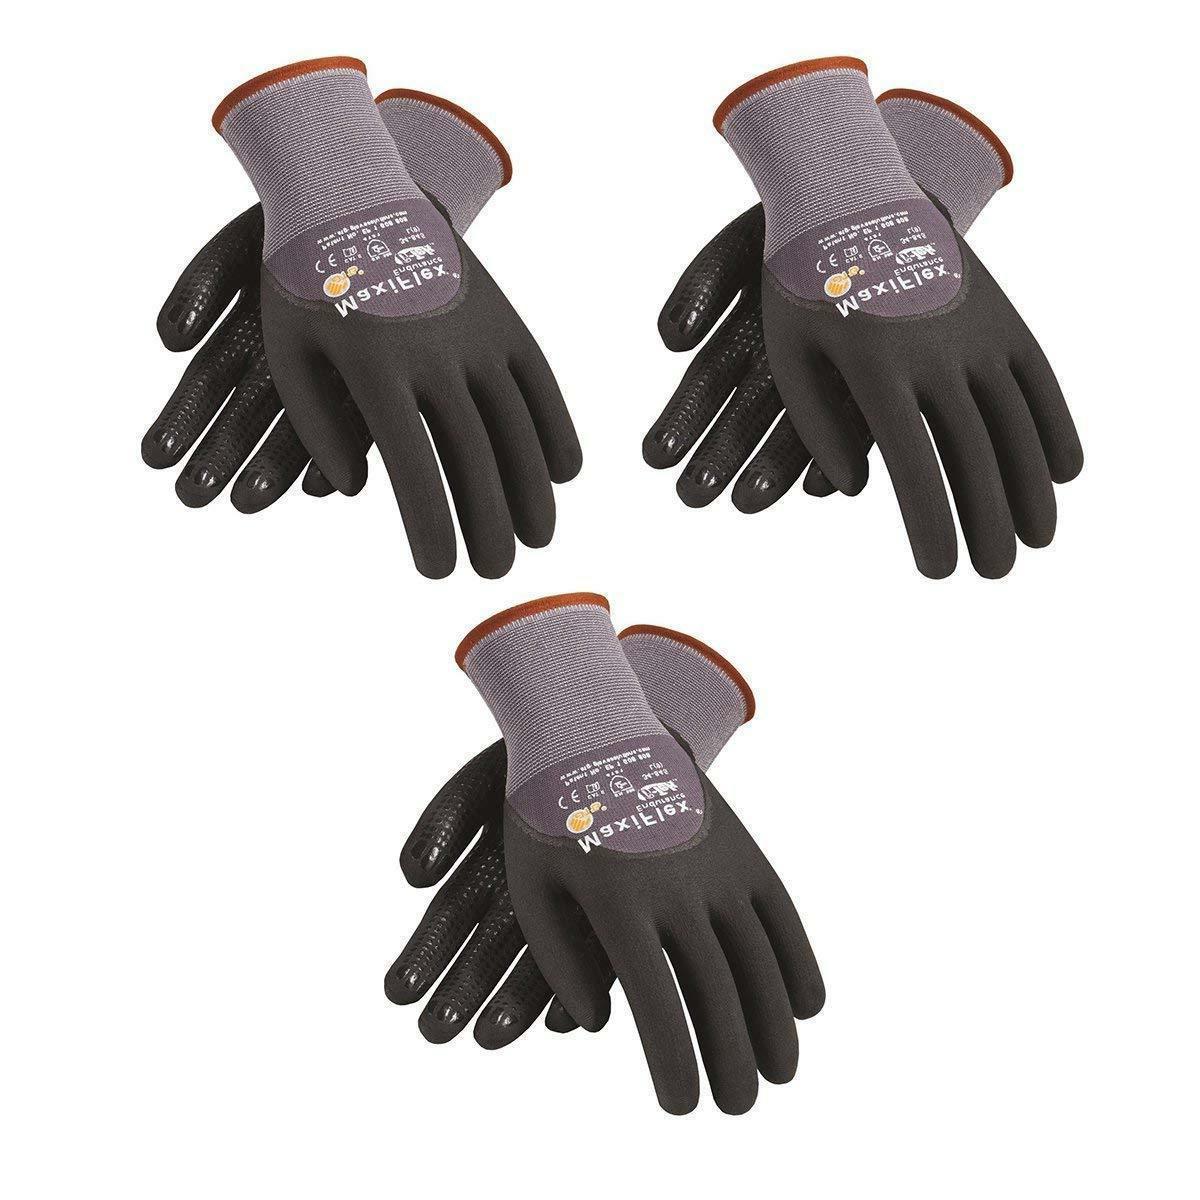 PIP 34-845 MaxiFlex Palms Micro-Foam Gloves Size: